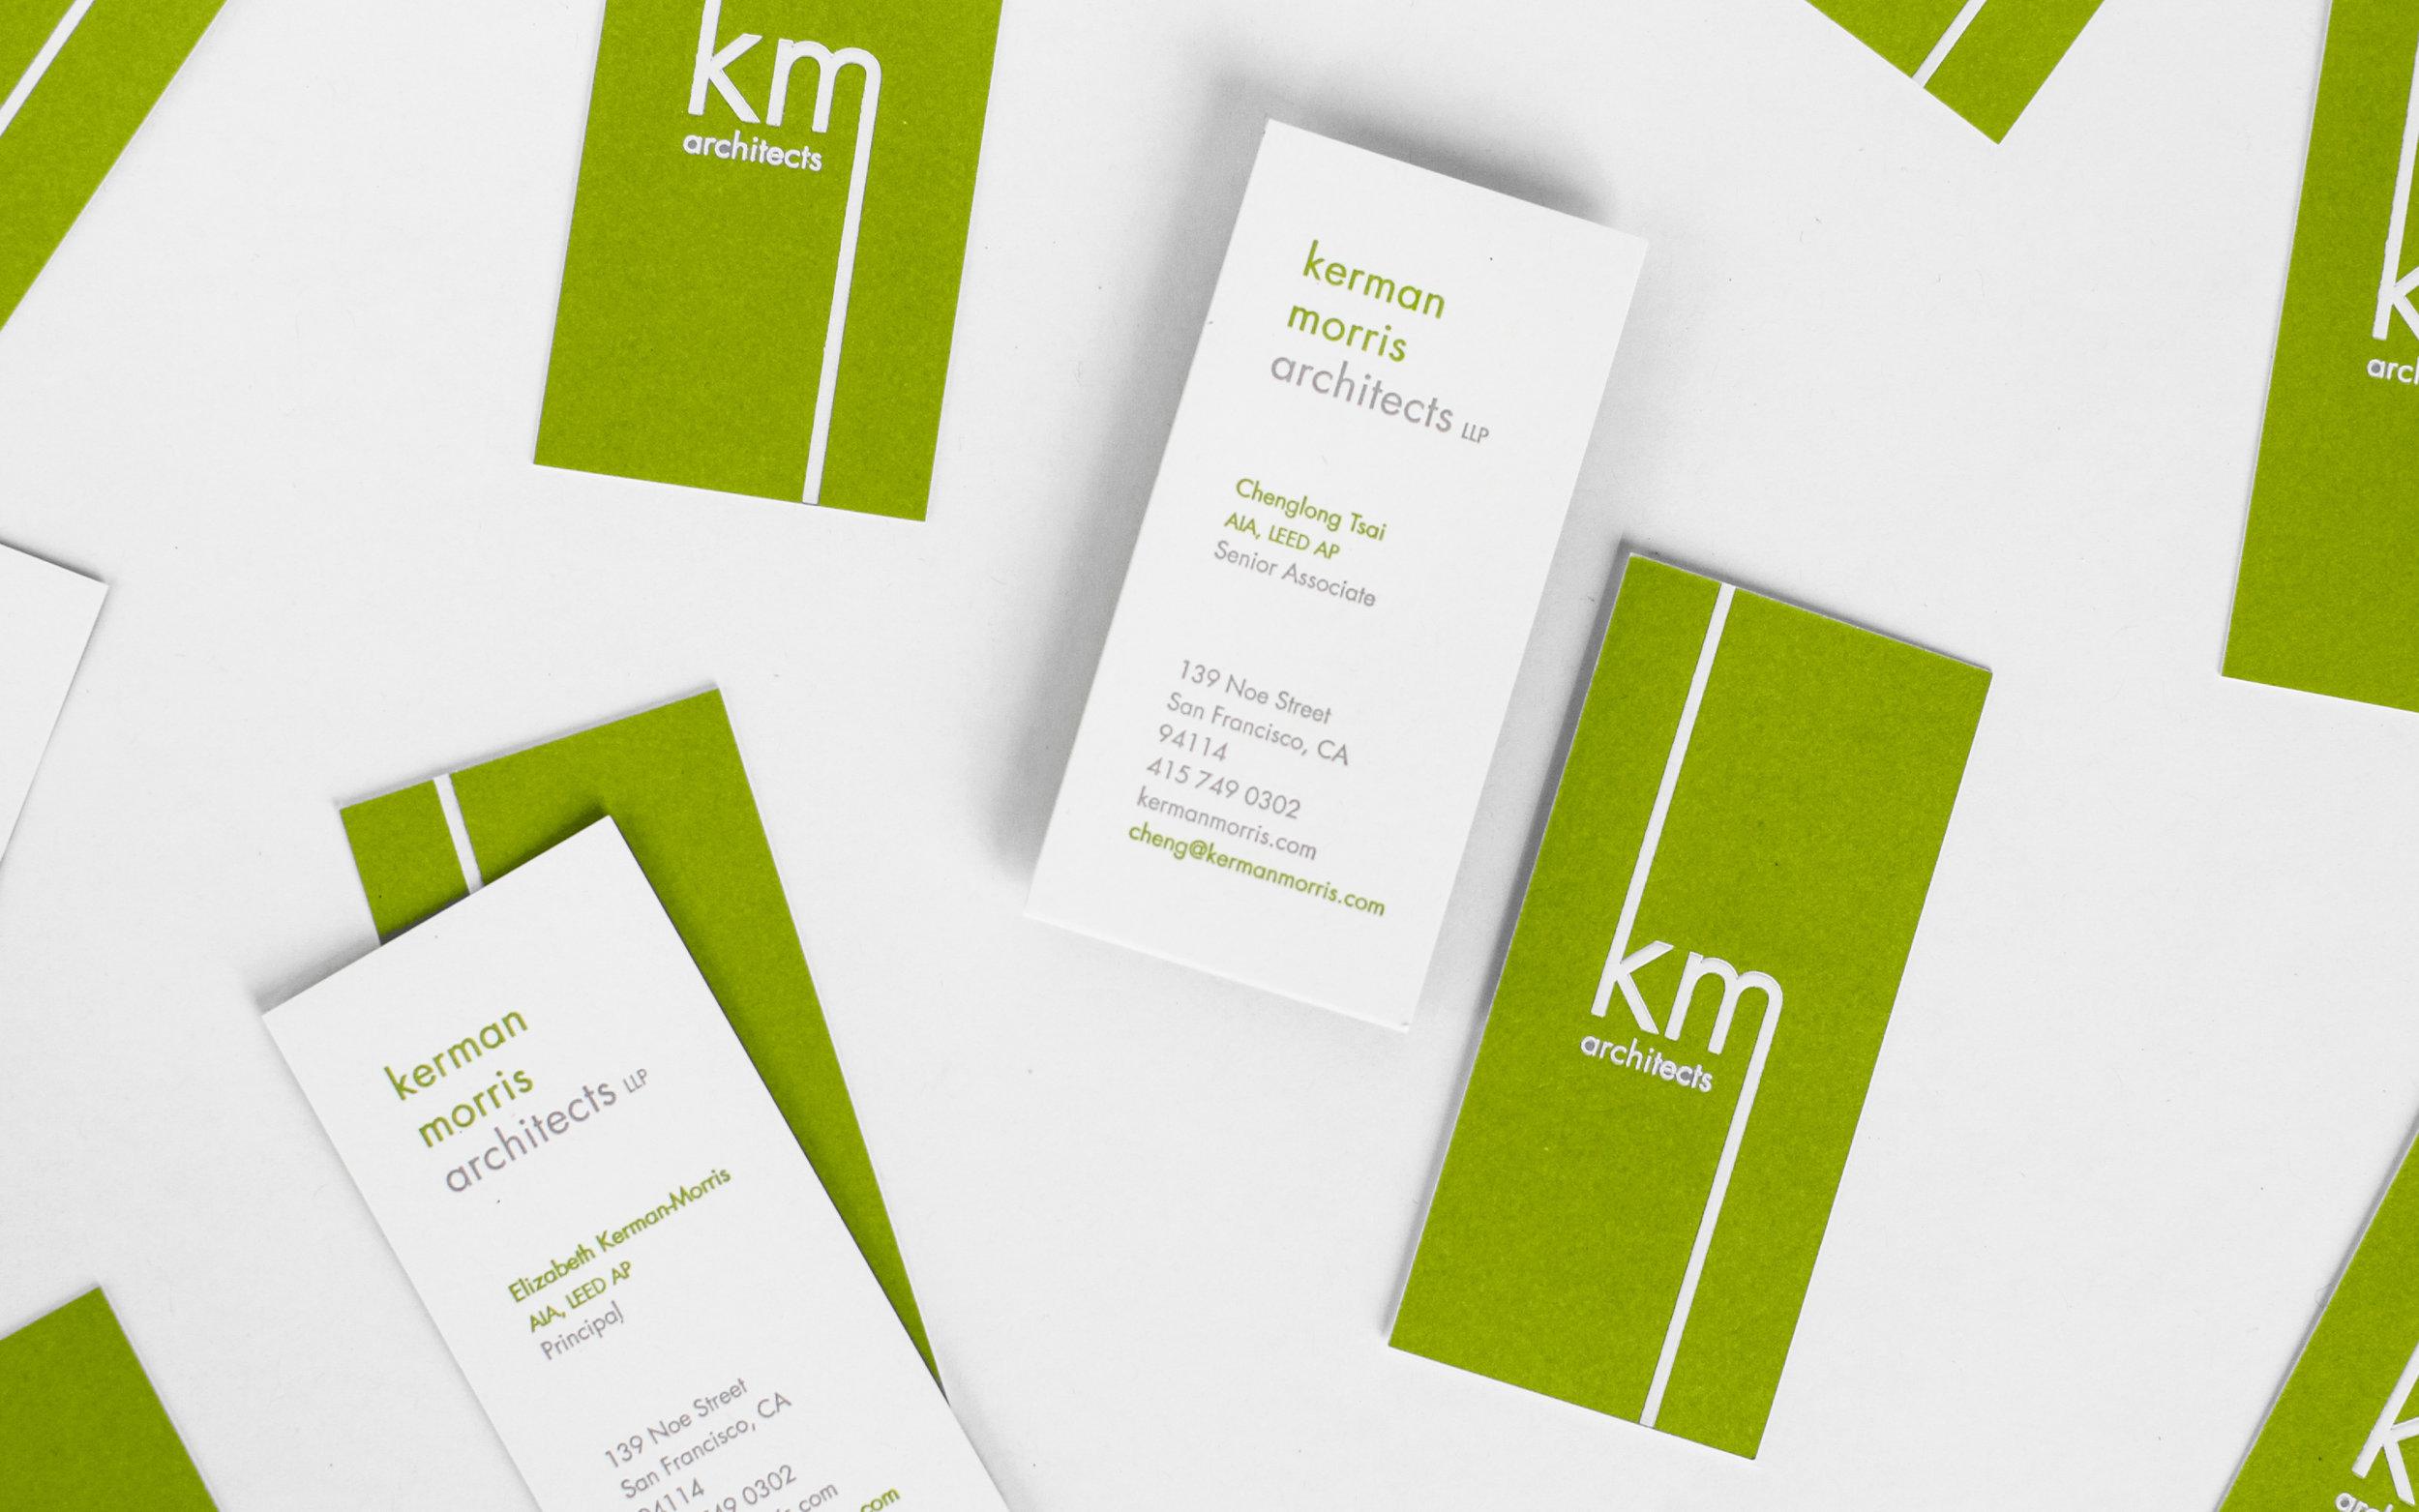 Letterpressed business card design for Kerman Morris Architects.